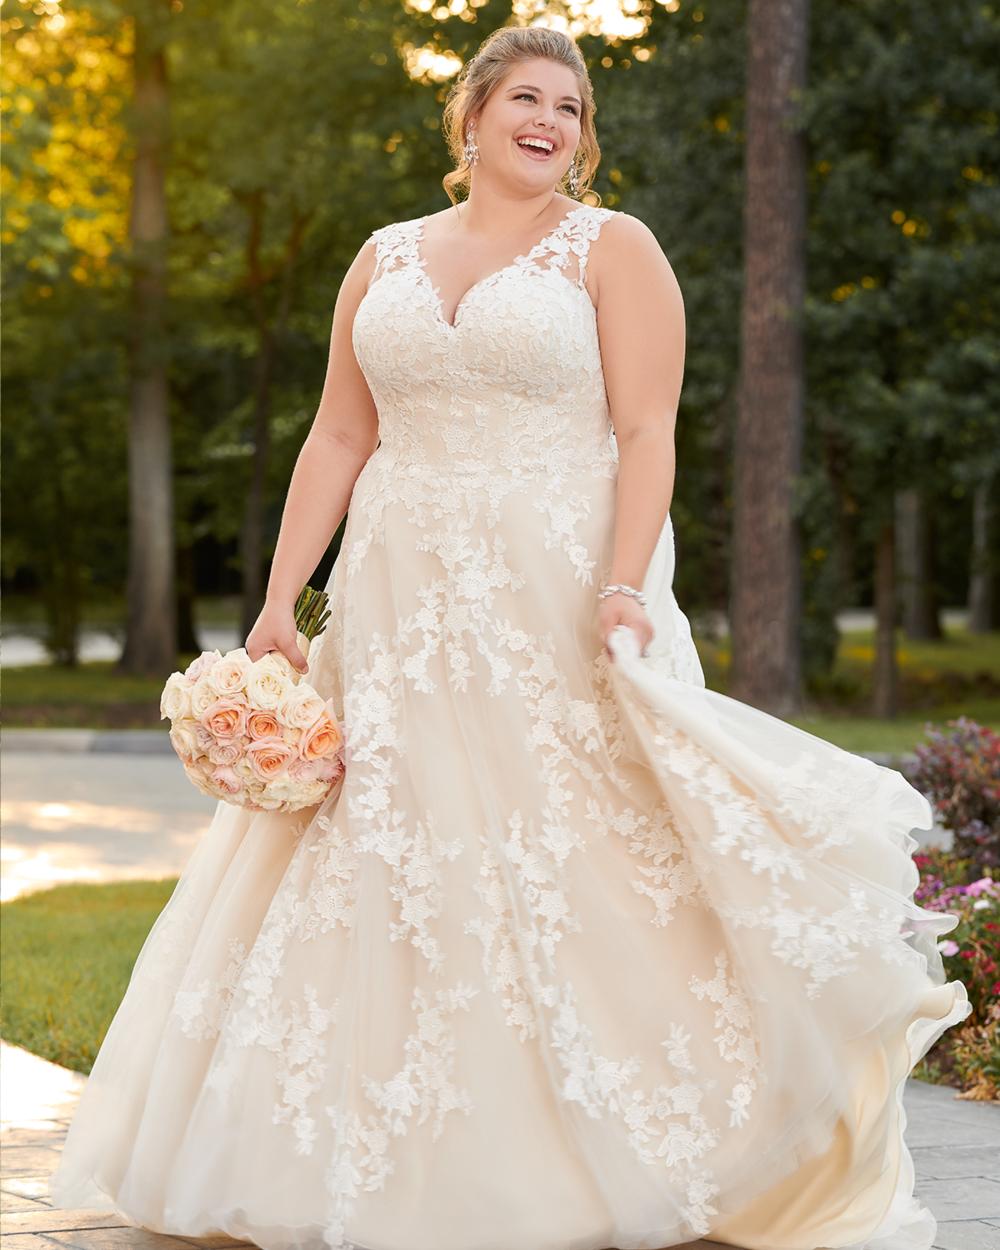 plus-size-wedding-dresses-stella-new-york.png